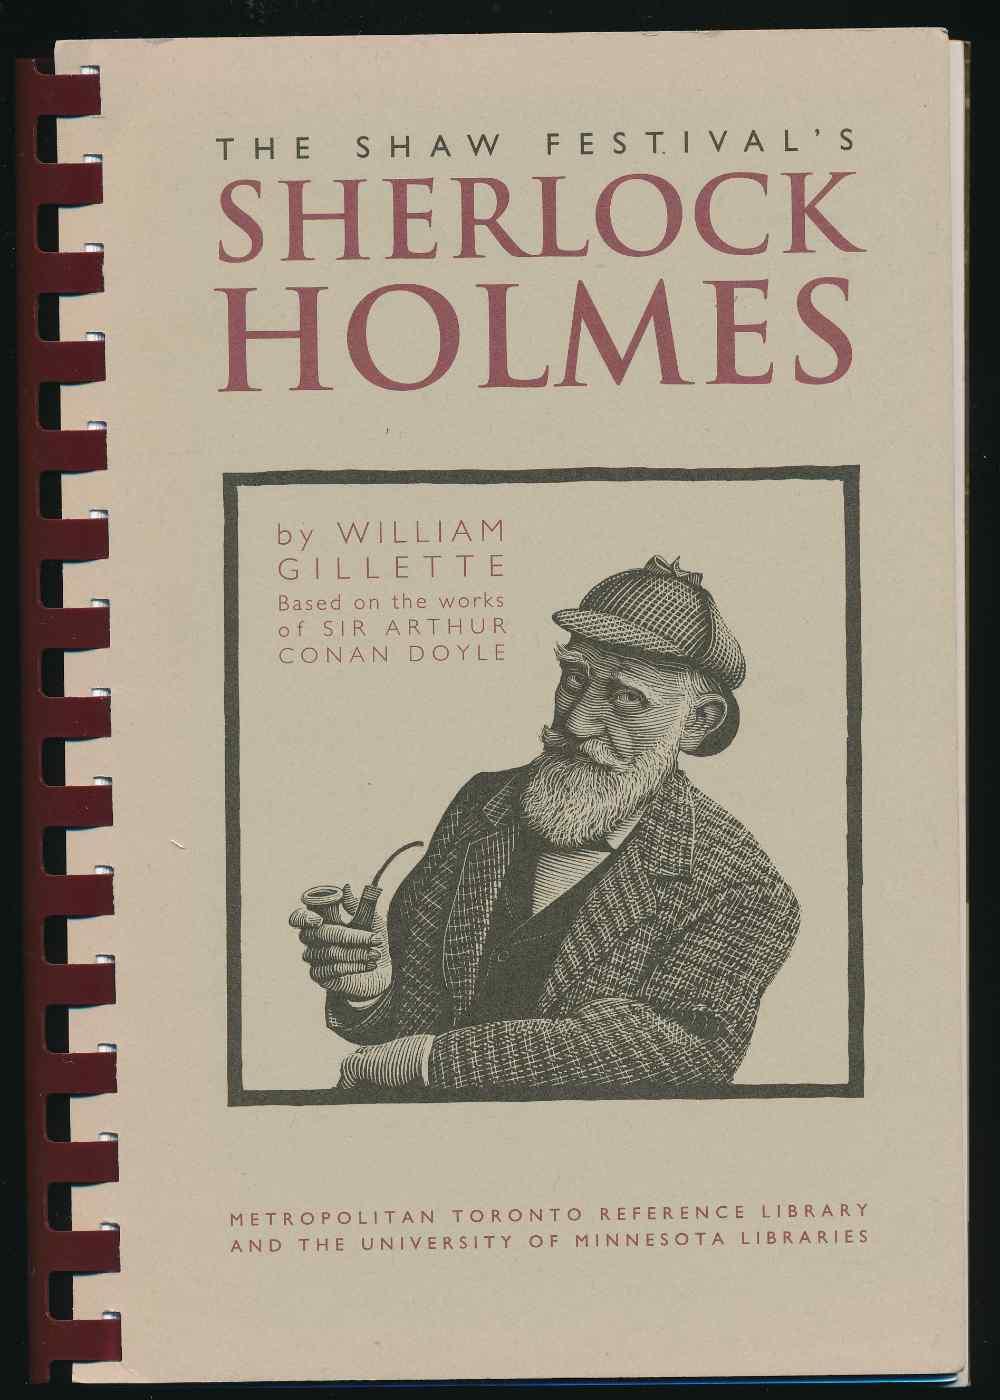 The Shaw Festival's Sherlock Holmes